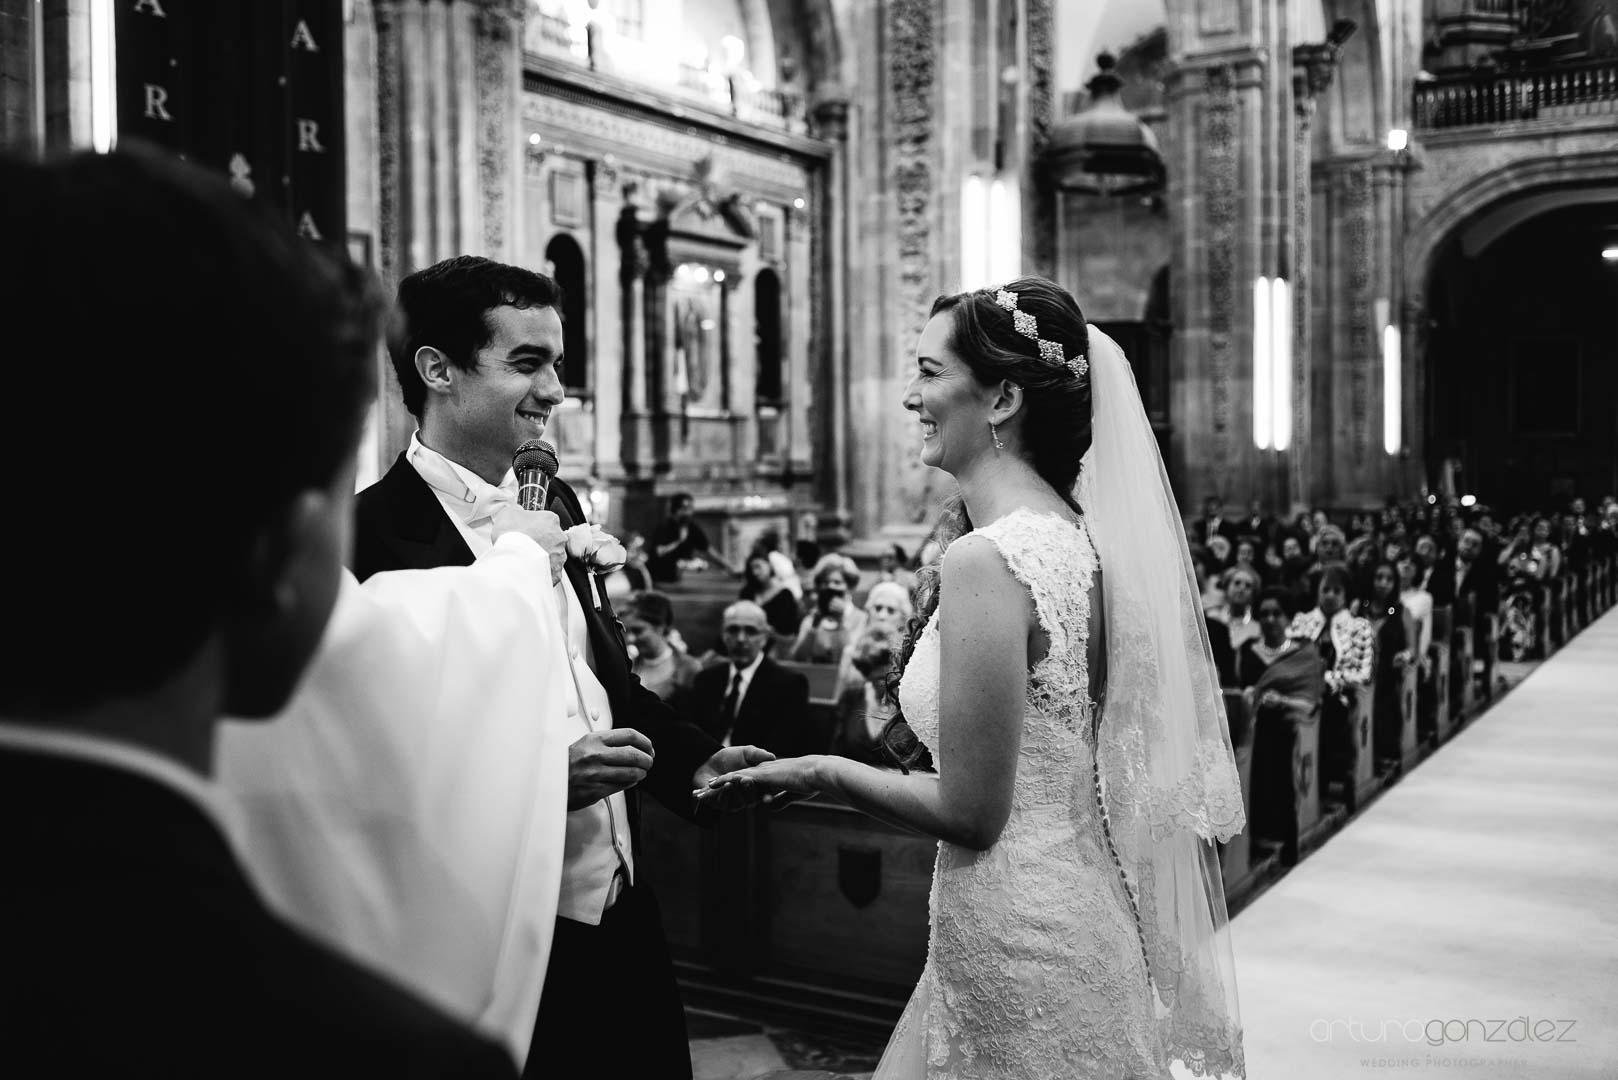 fotografo-de-bodas-en-guanajuato-74